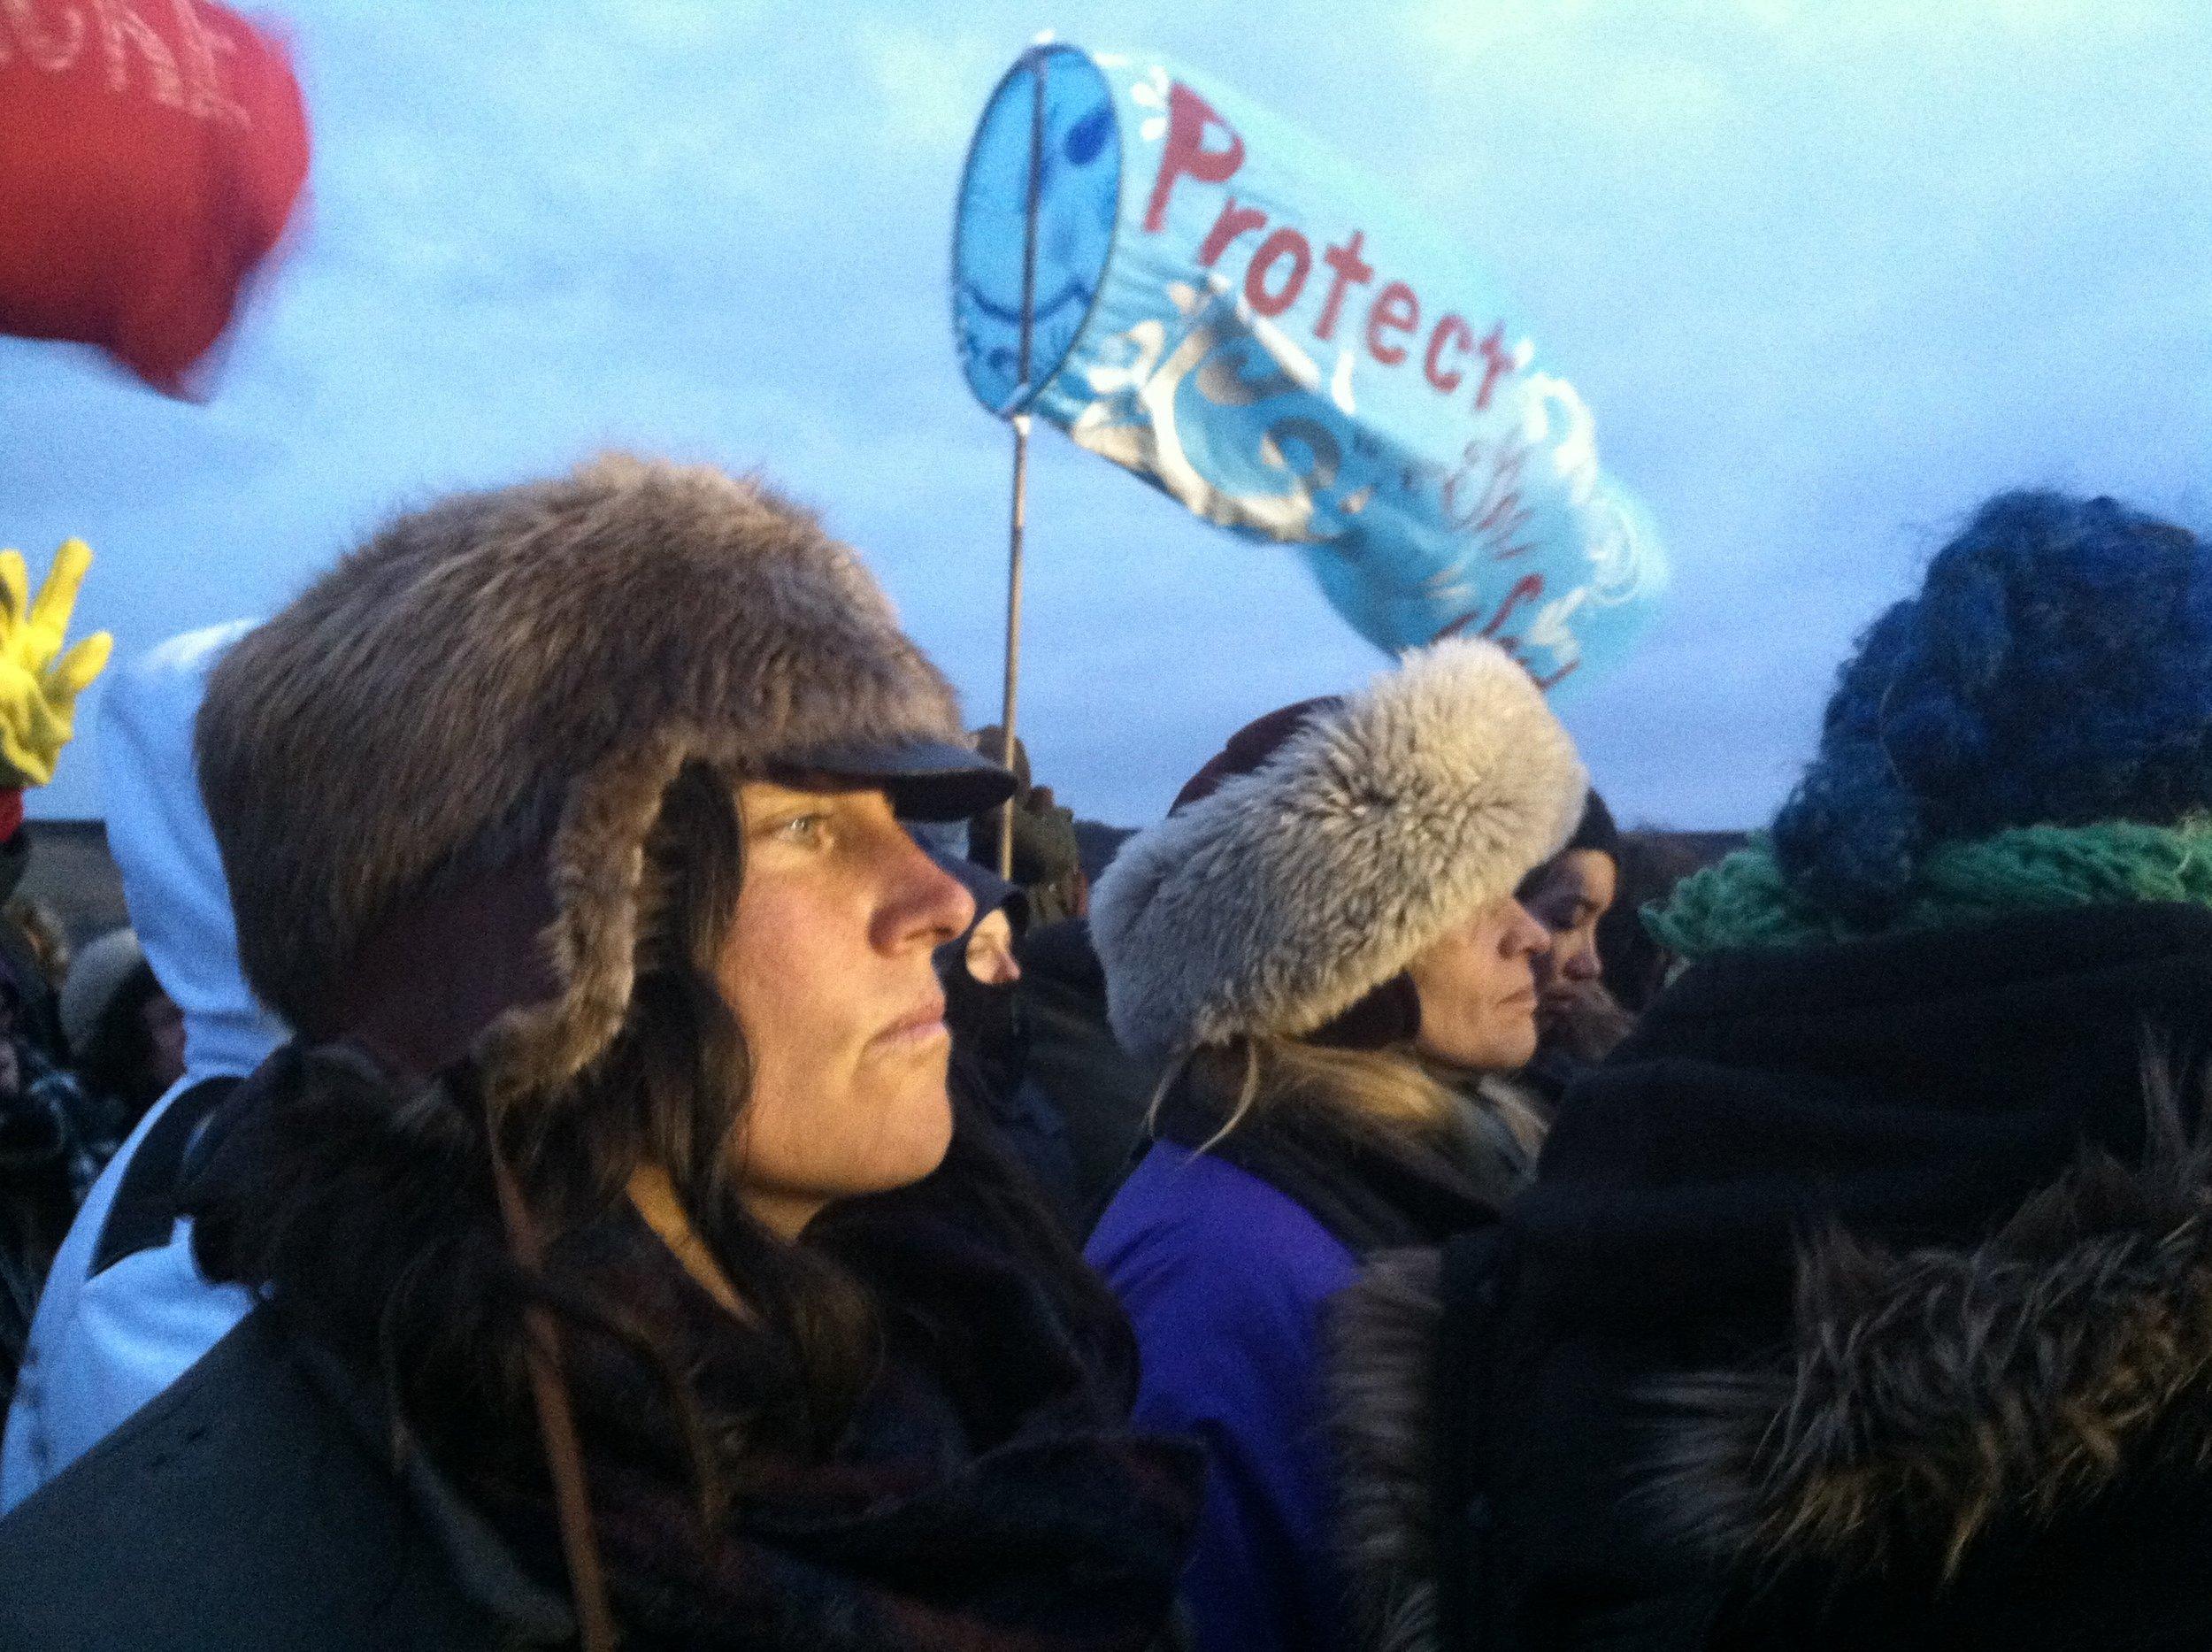 Emy during silent prayer action on Sunday, November 27th.